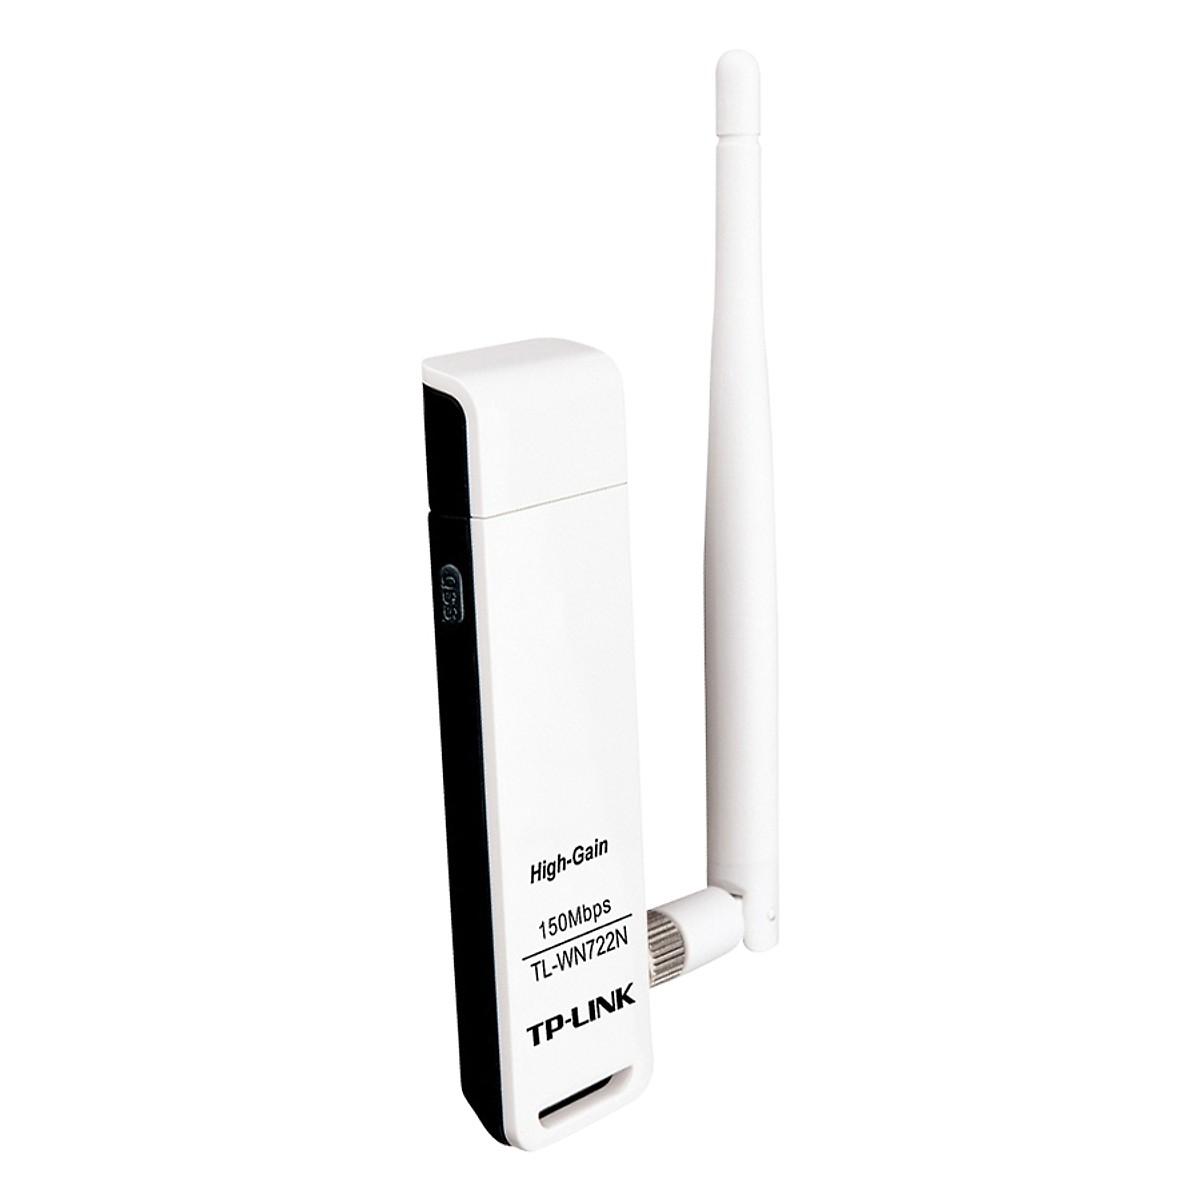 usb wifi tp link tl wn722n high gain toc do 150mbps